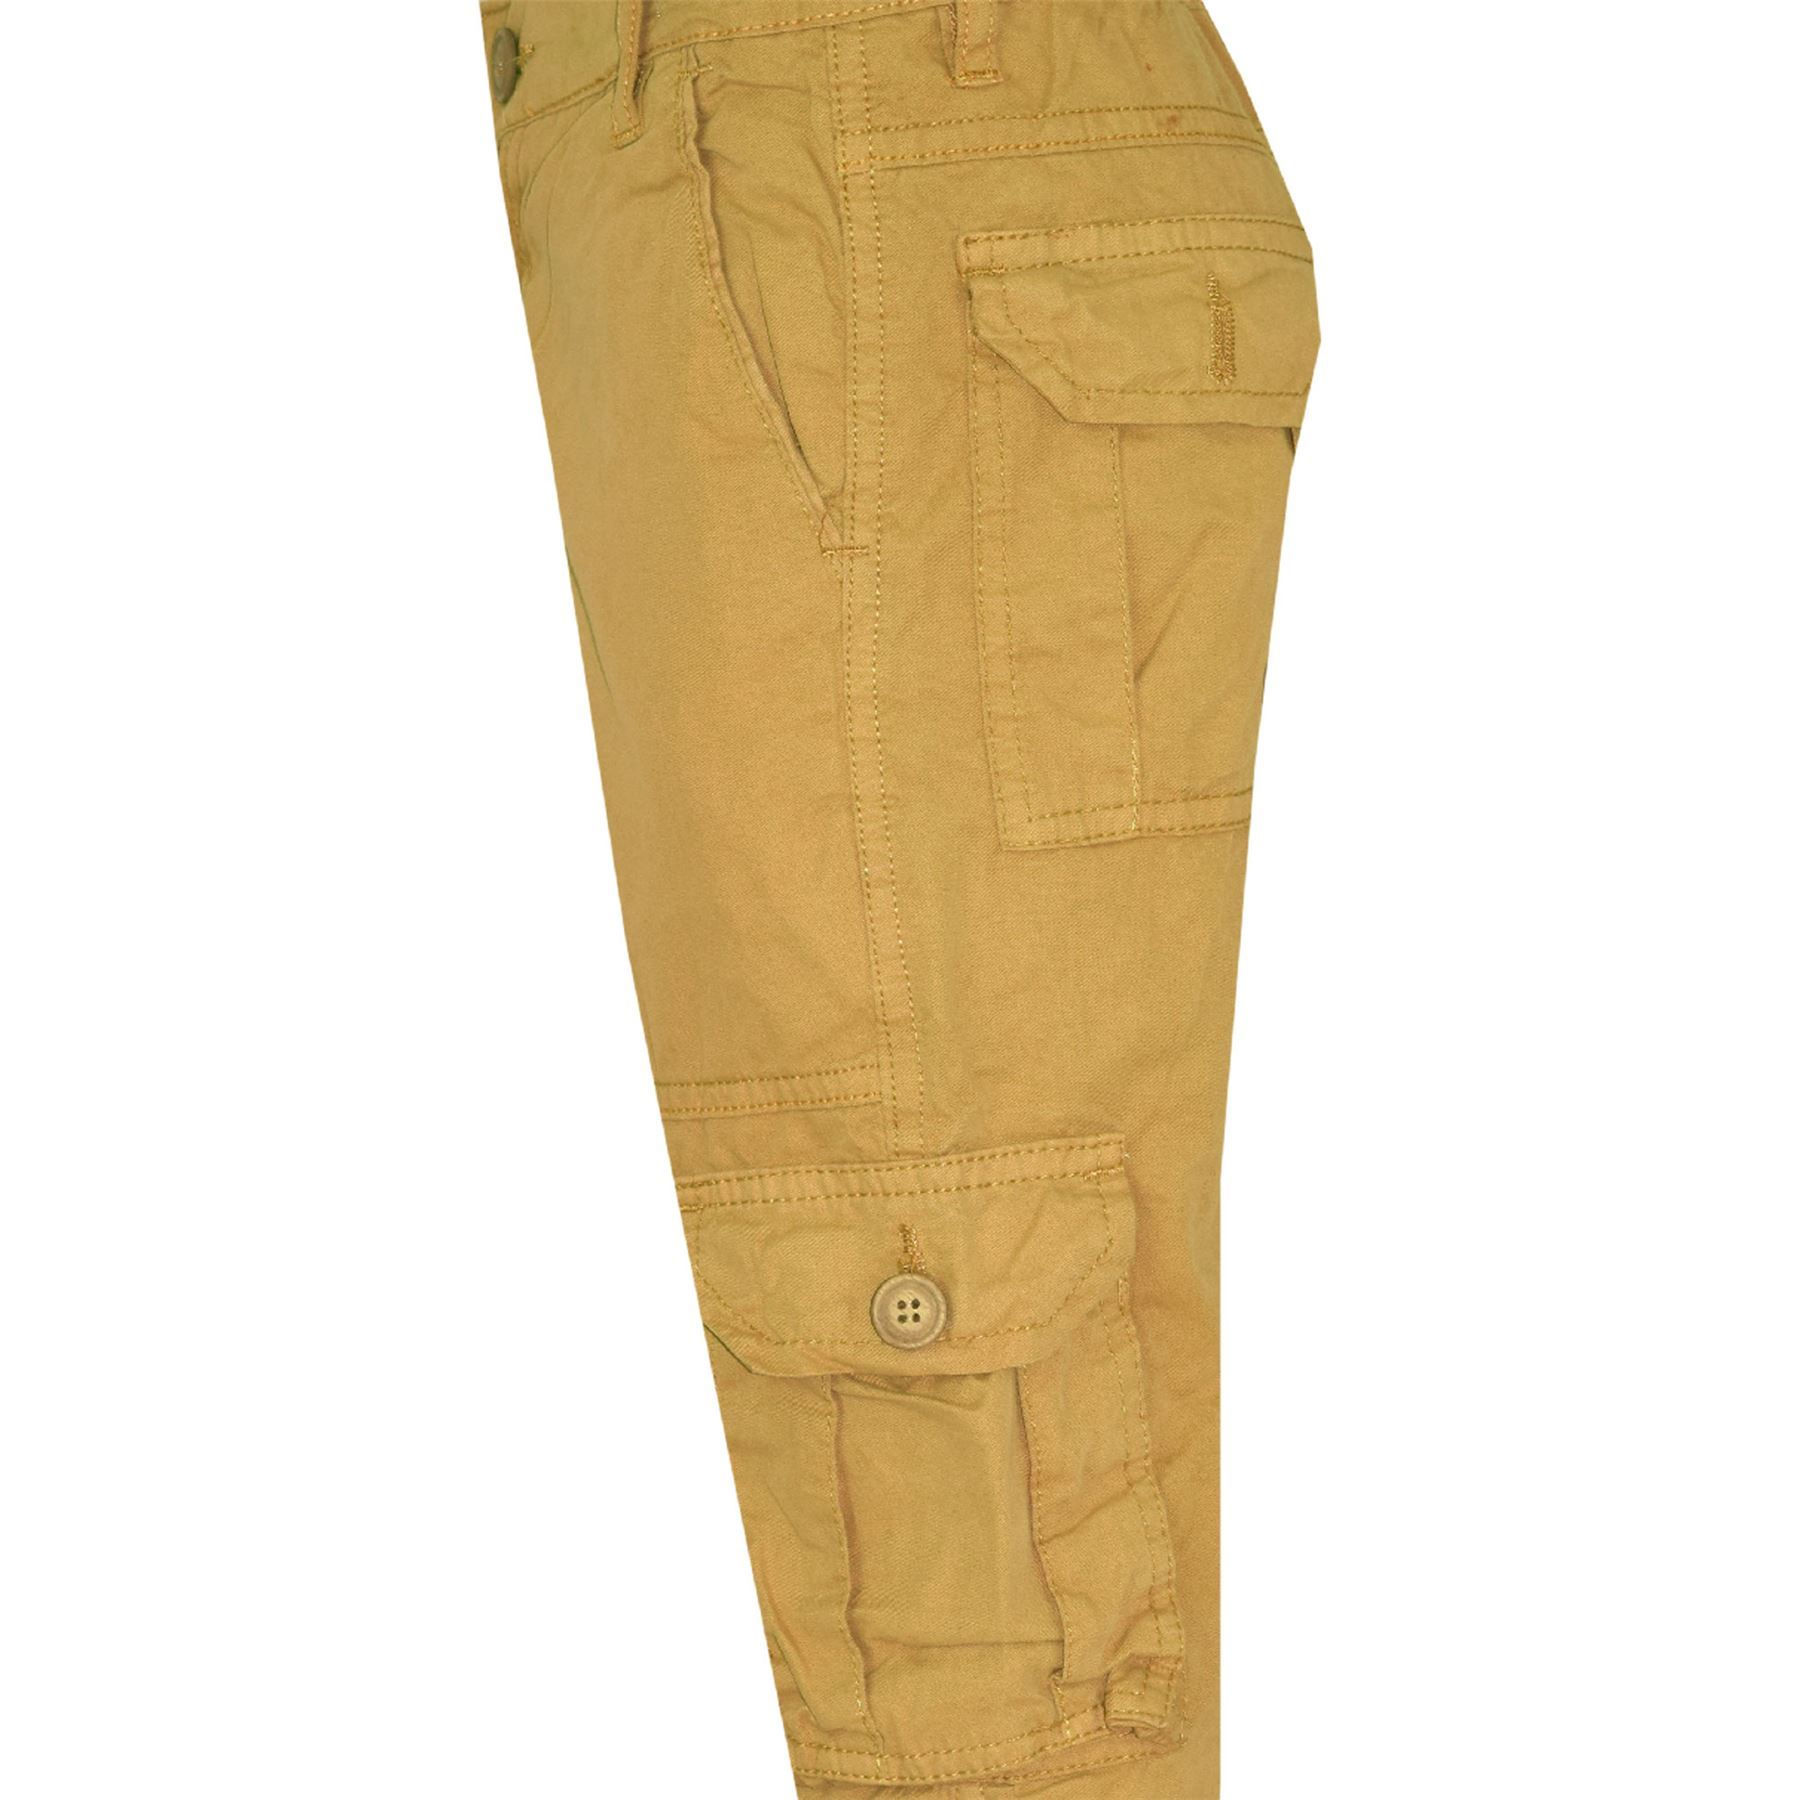 Bambini Ragazzi Bdu Ranger 6-Pocket Cachi Stile Militare Pantaloni Moda 5-13